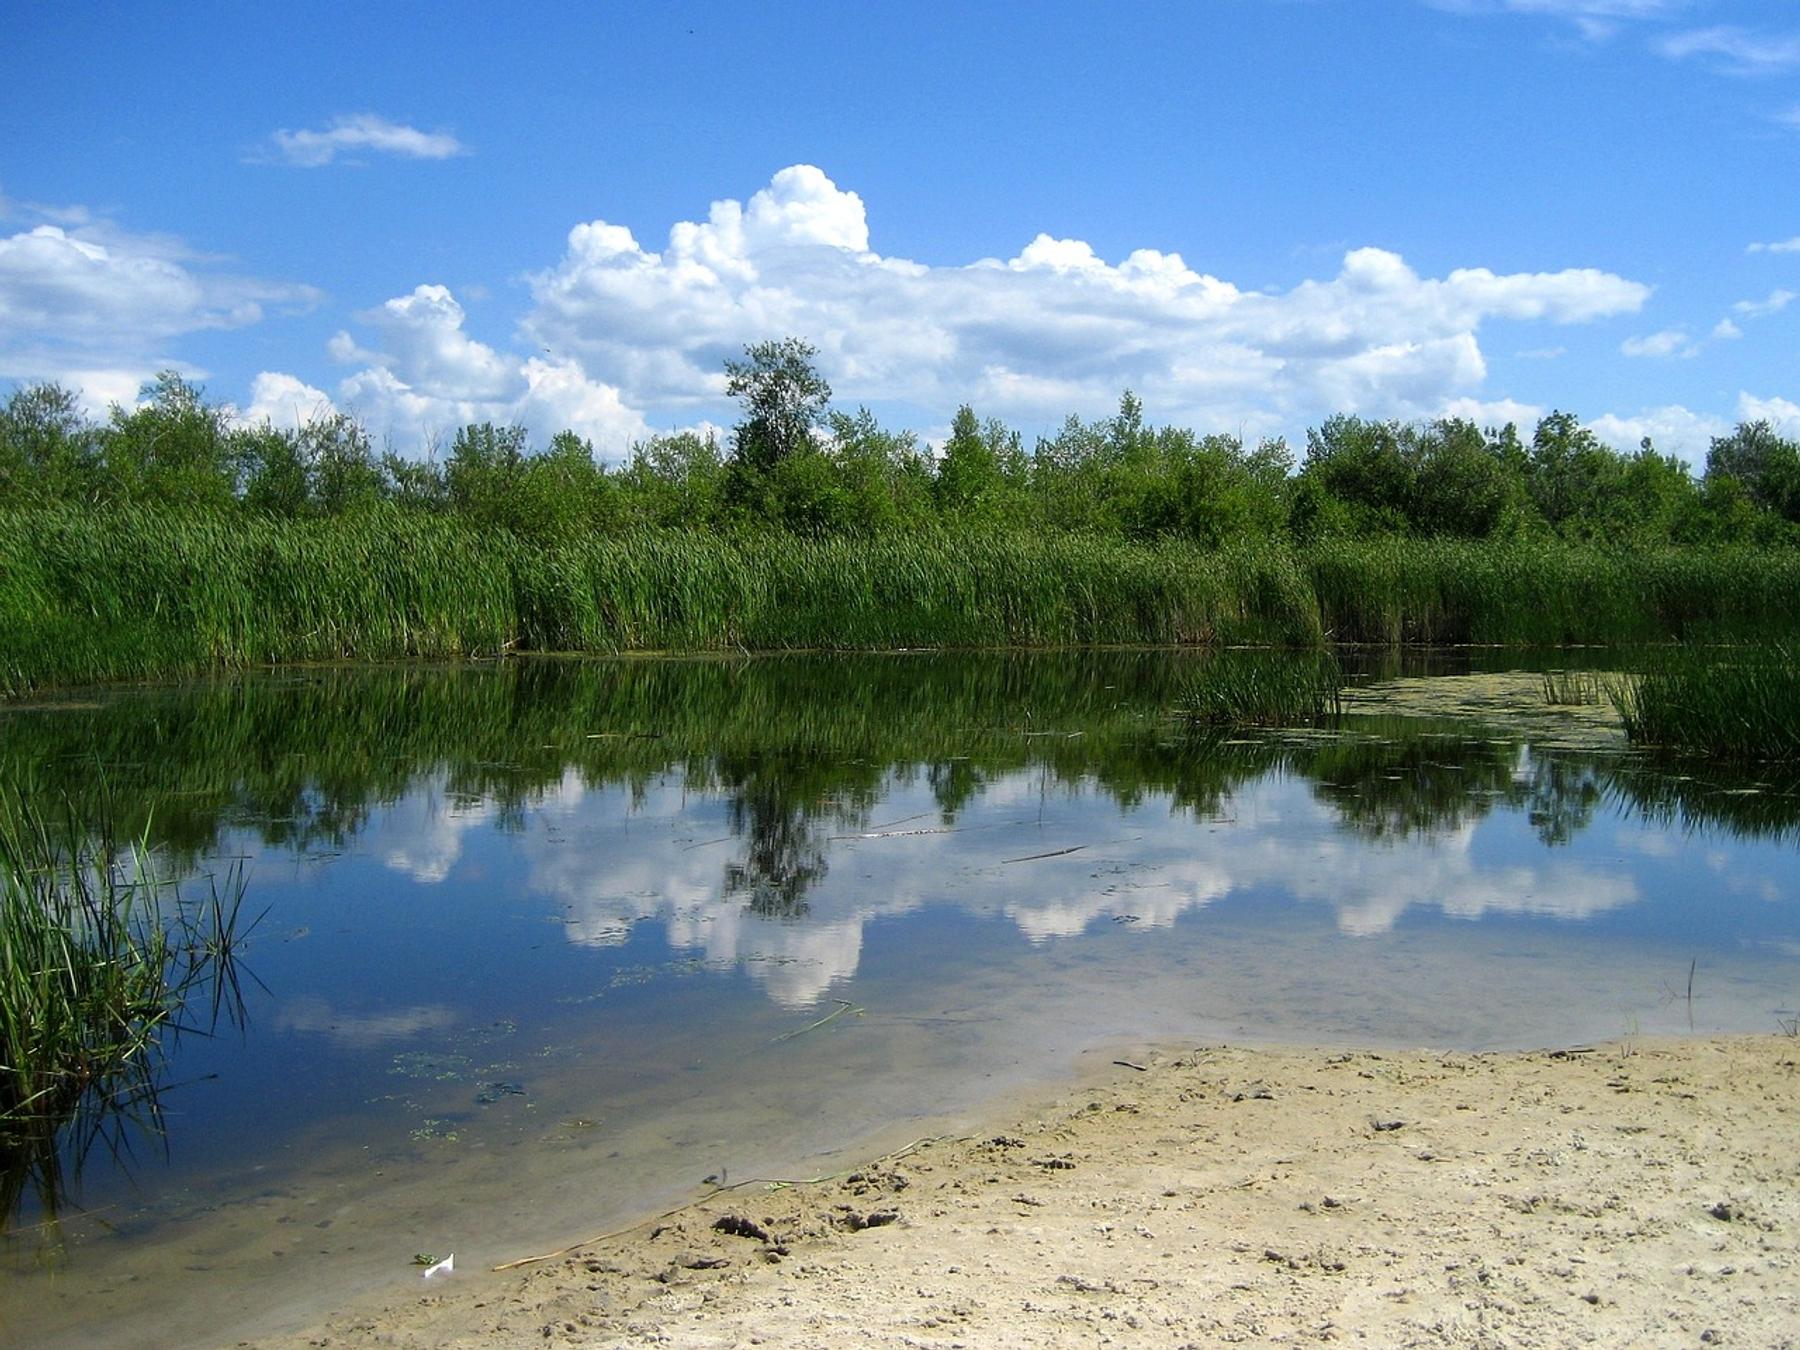 Clear waters of of Grand Bend Beach in Lake Winnipeg